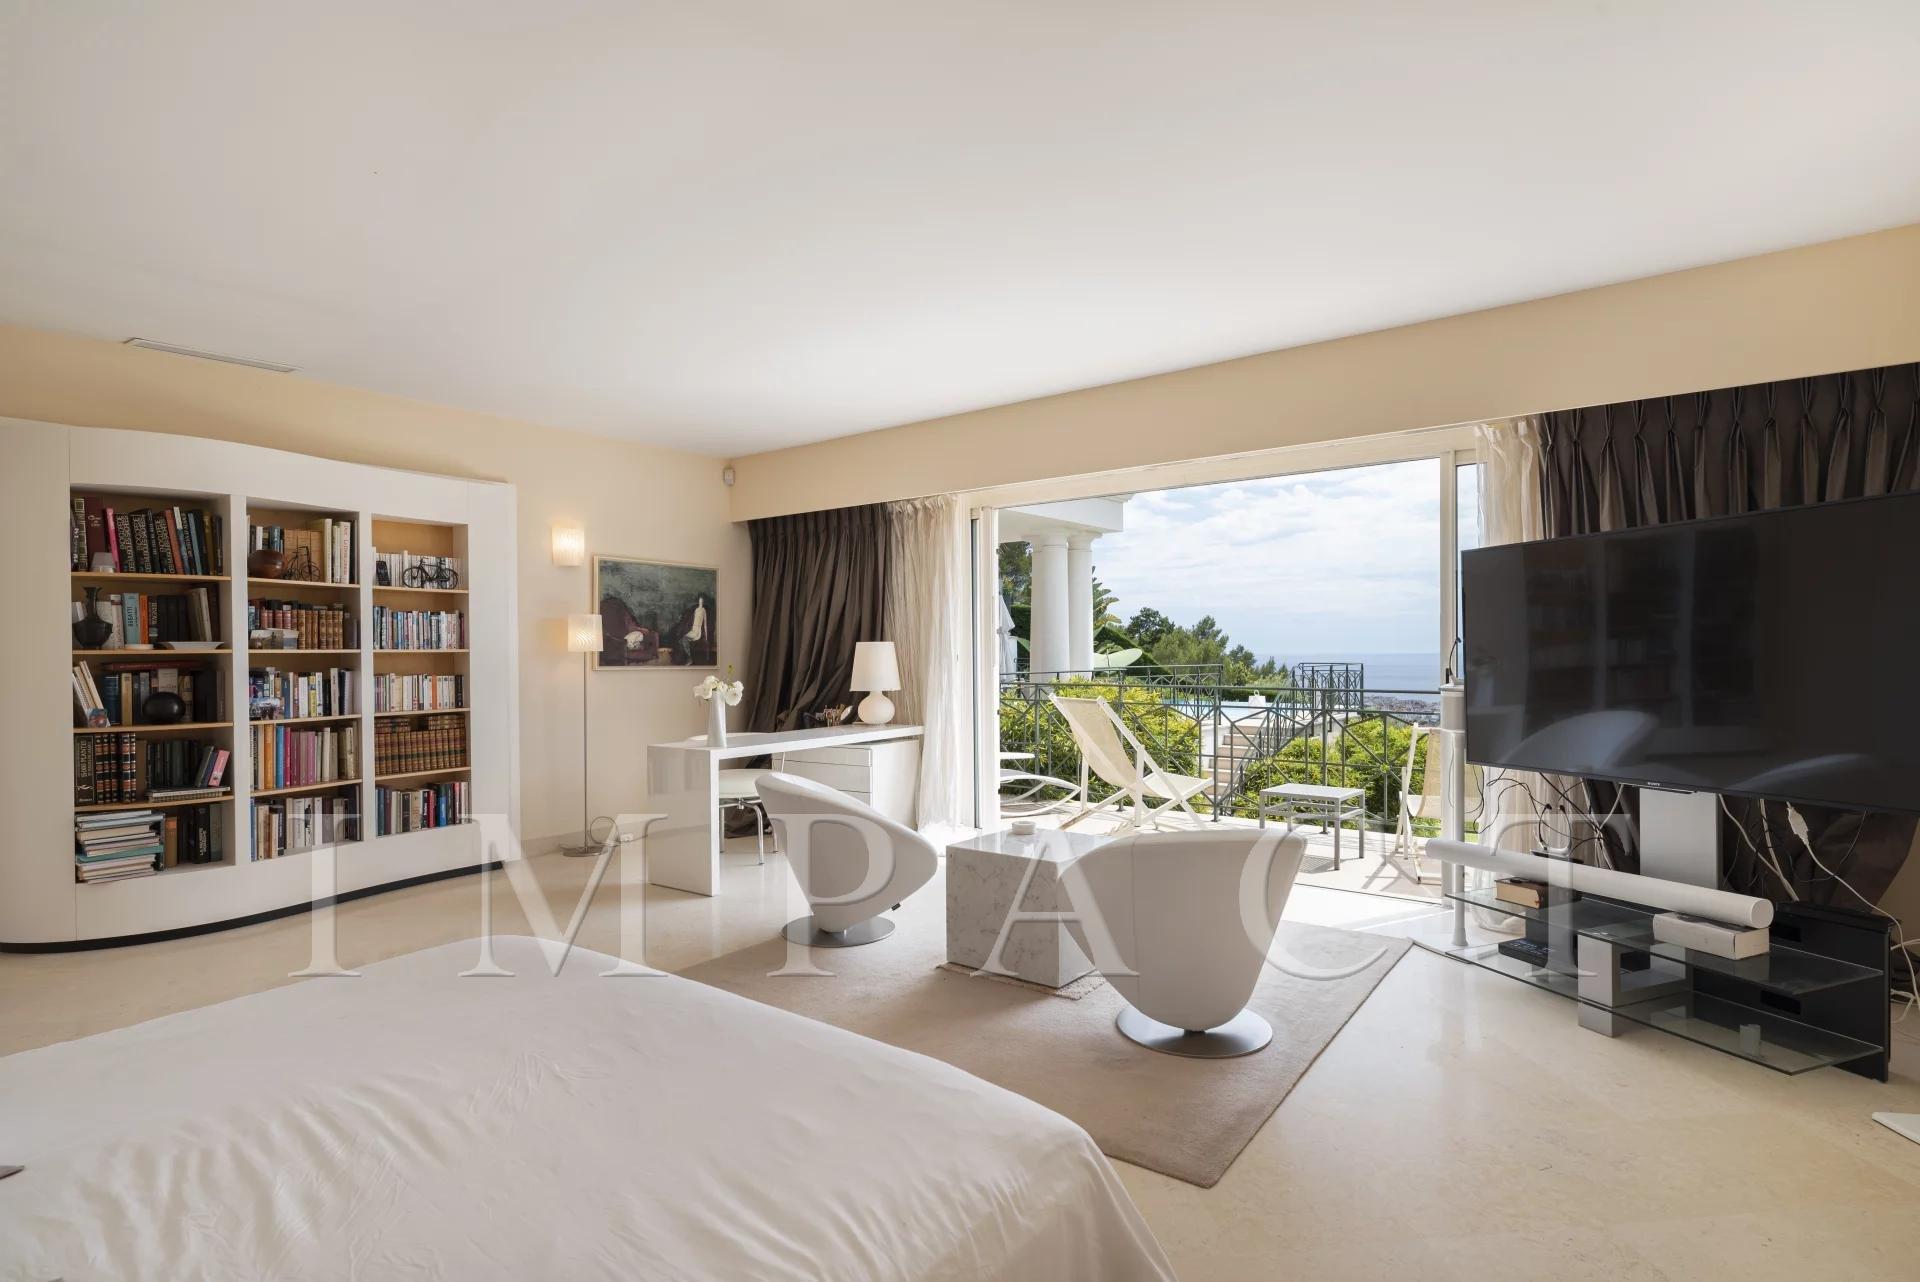 Villa à louer proche Cannes